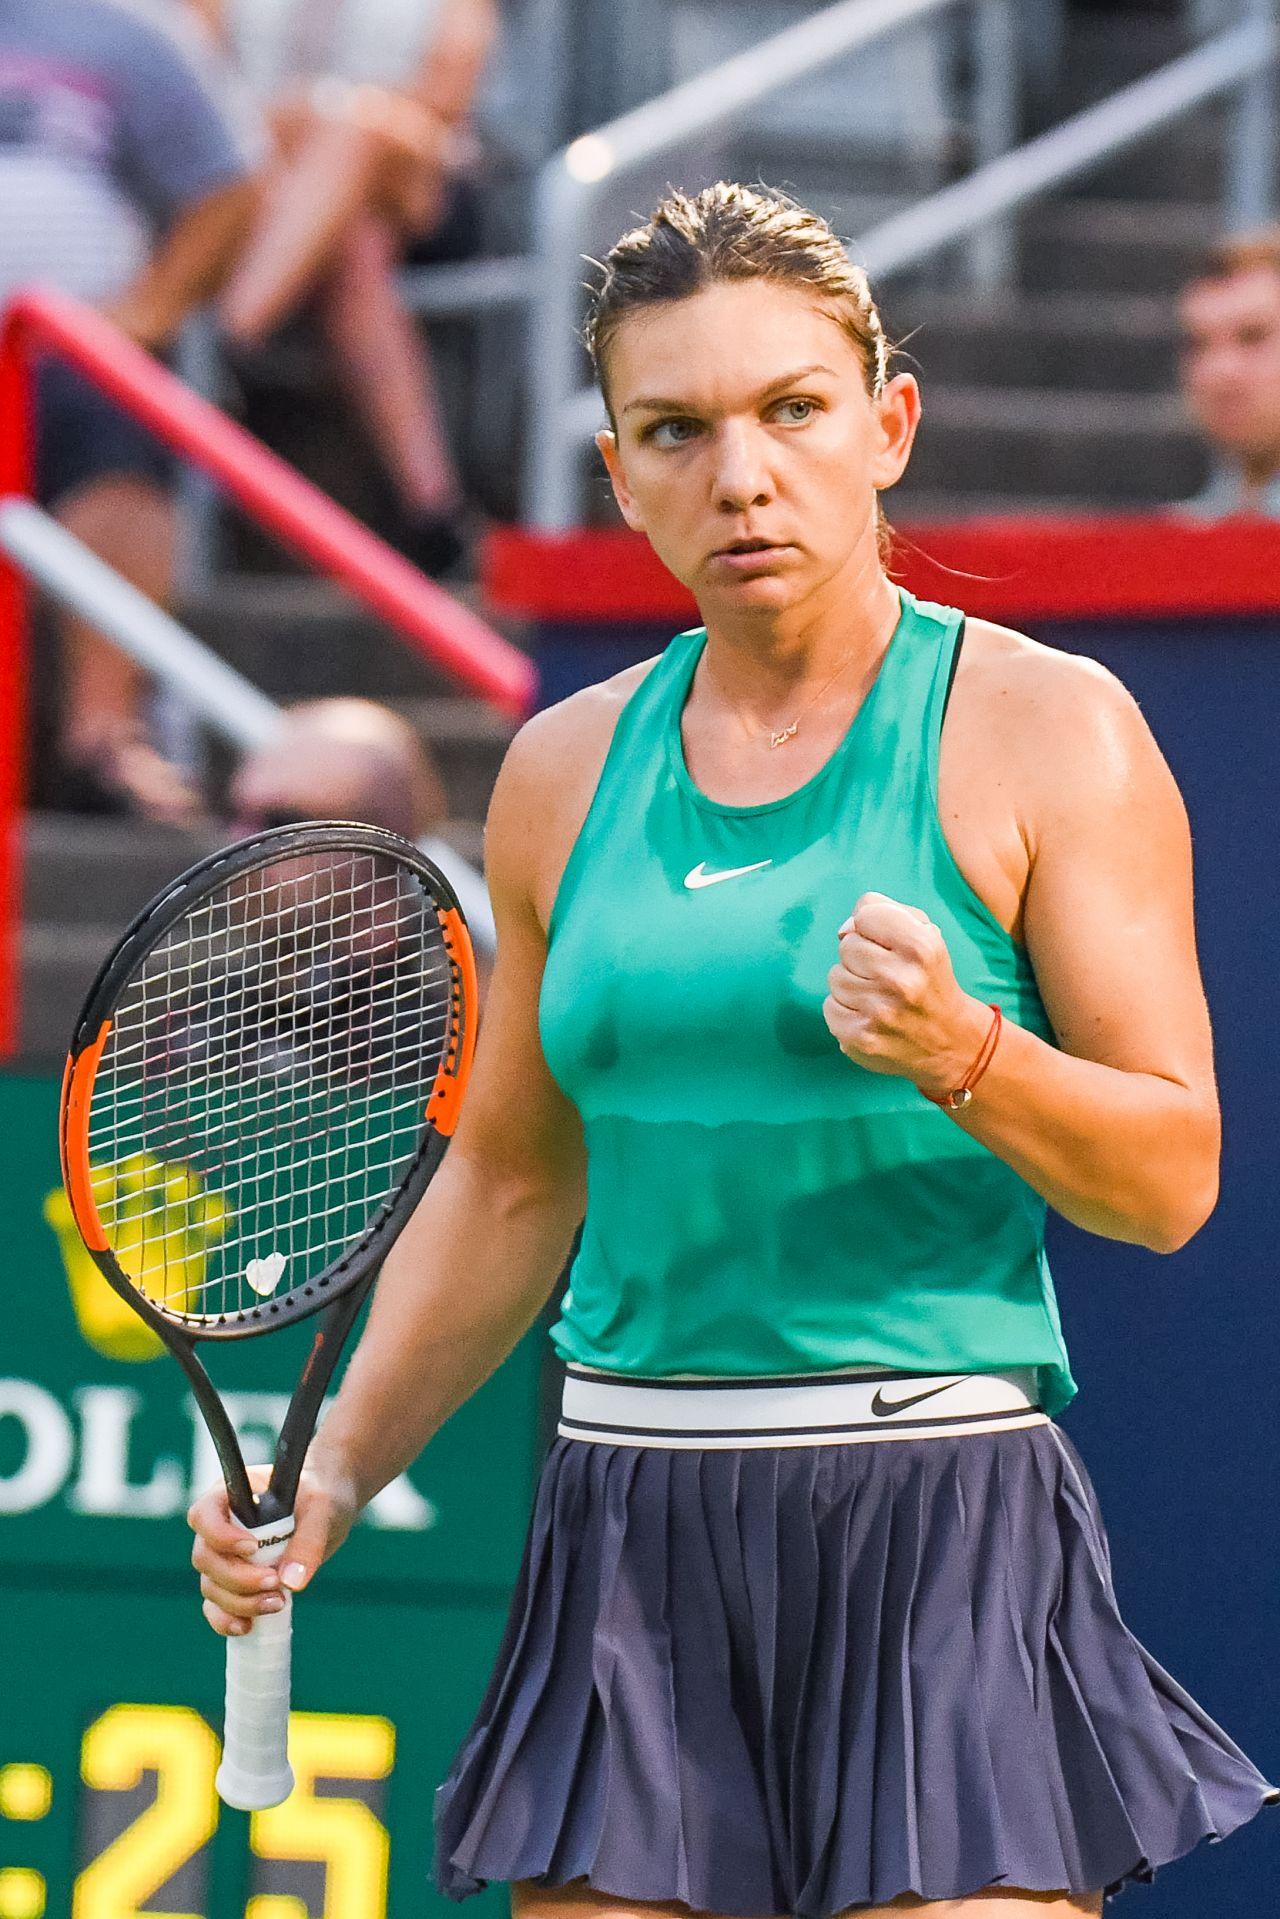 Simona Halep destroys Serena Williams in Wimbledon final ...  |Simona Halep